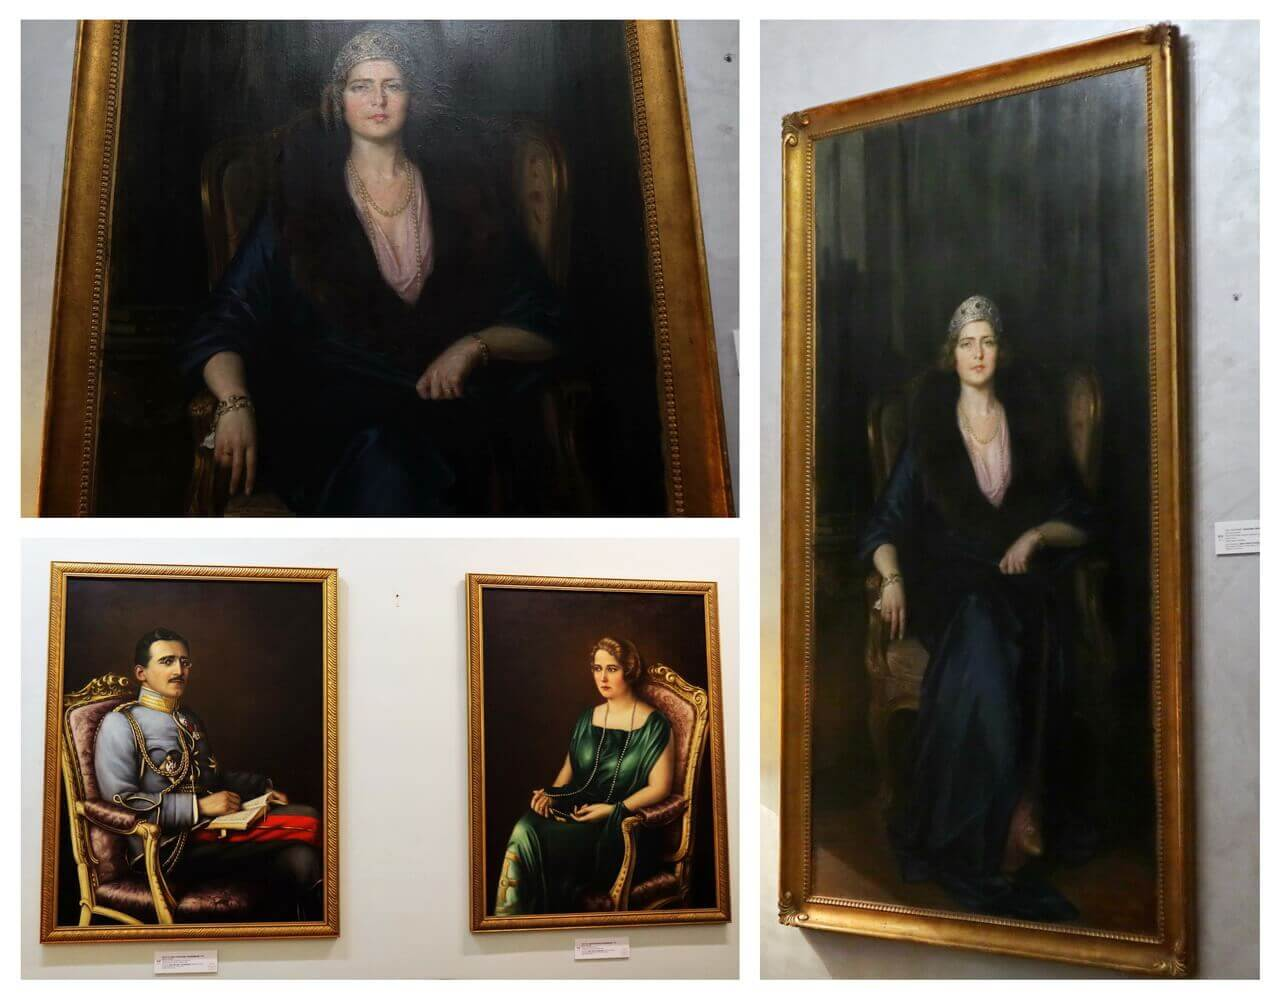 Queen Mary Karadjordjević, exhibition